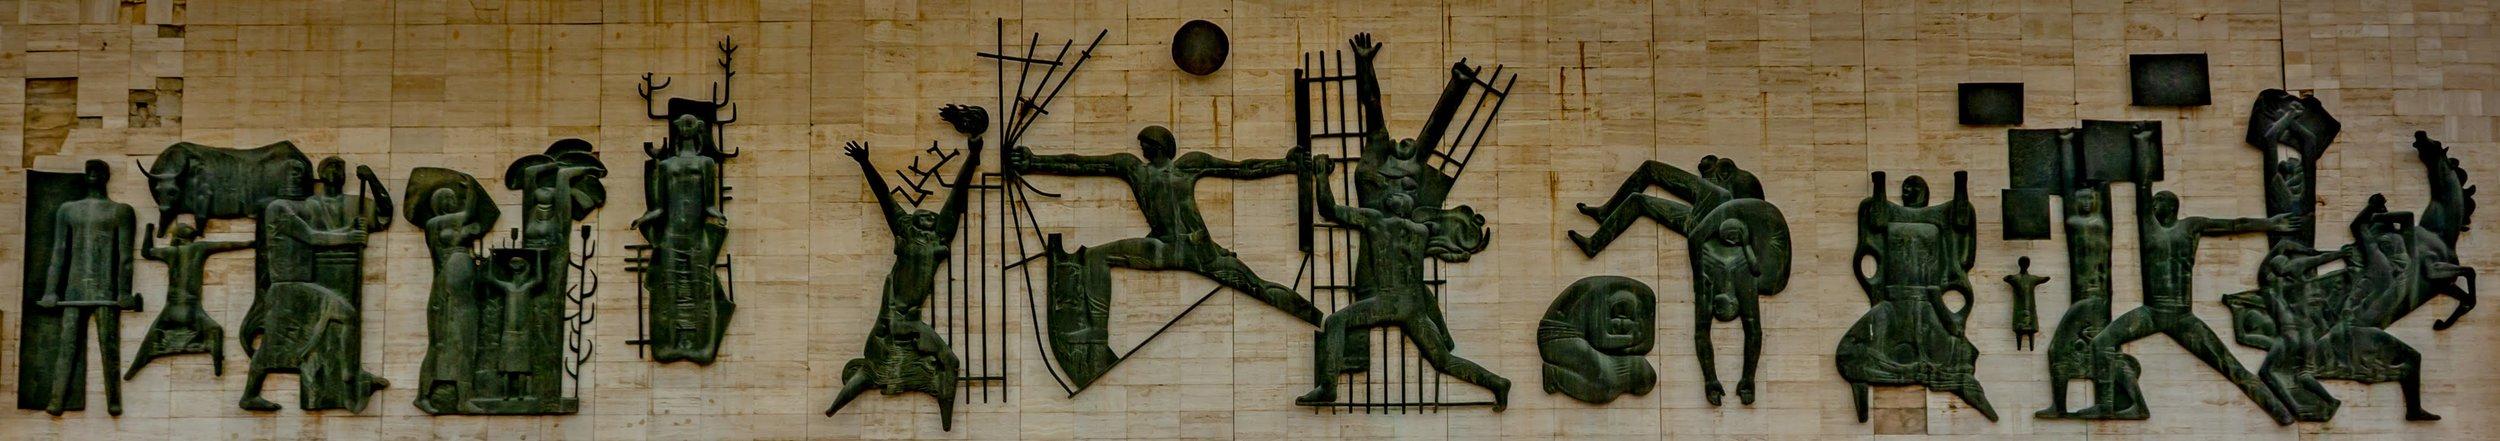 Jawad Salim,  Nusb al-Hurriya , 1961. Bronze on travertine, 50m x 8 m. Liberation Square, Baghdad.   Photo credit: Atheer Muhammad, 2018